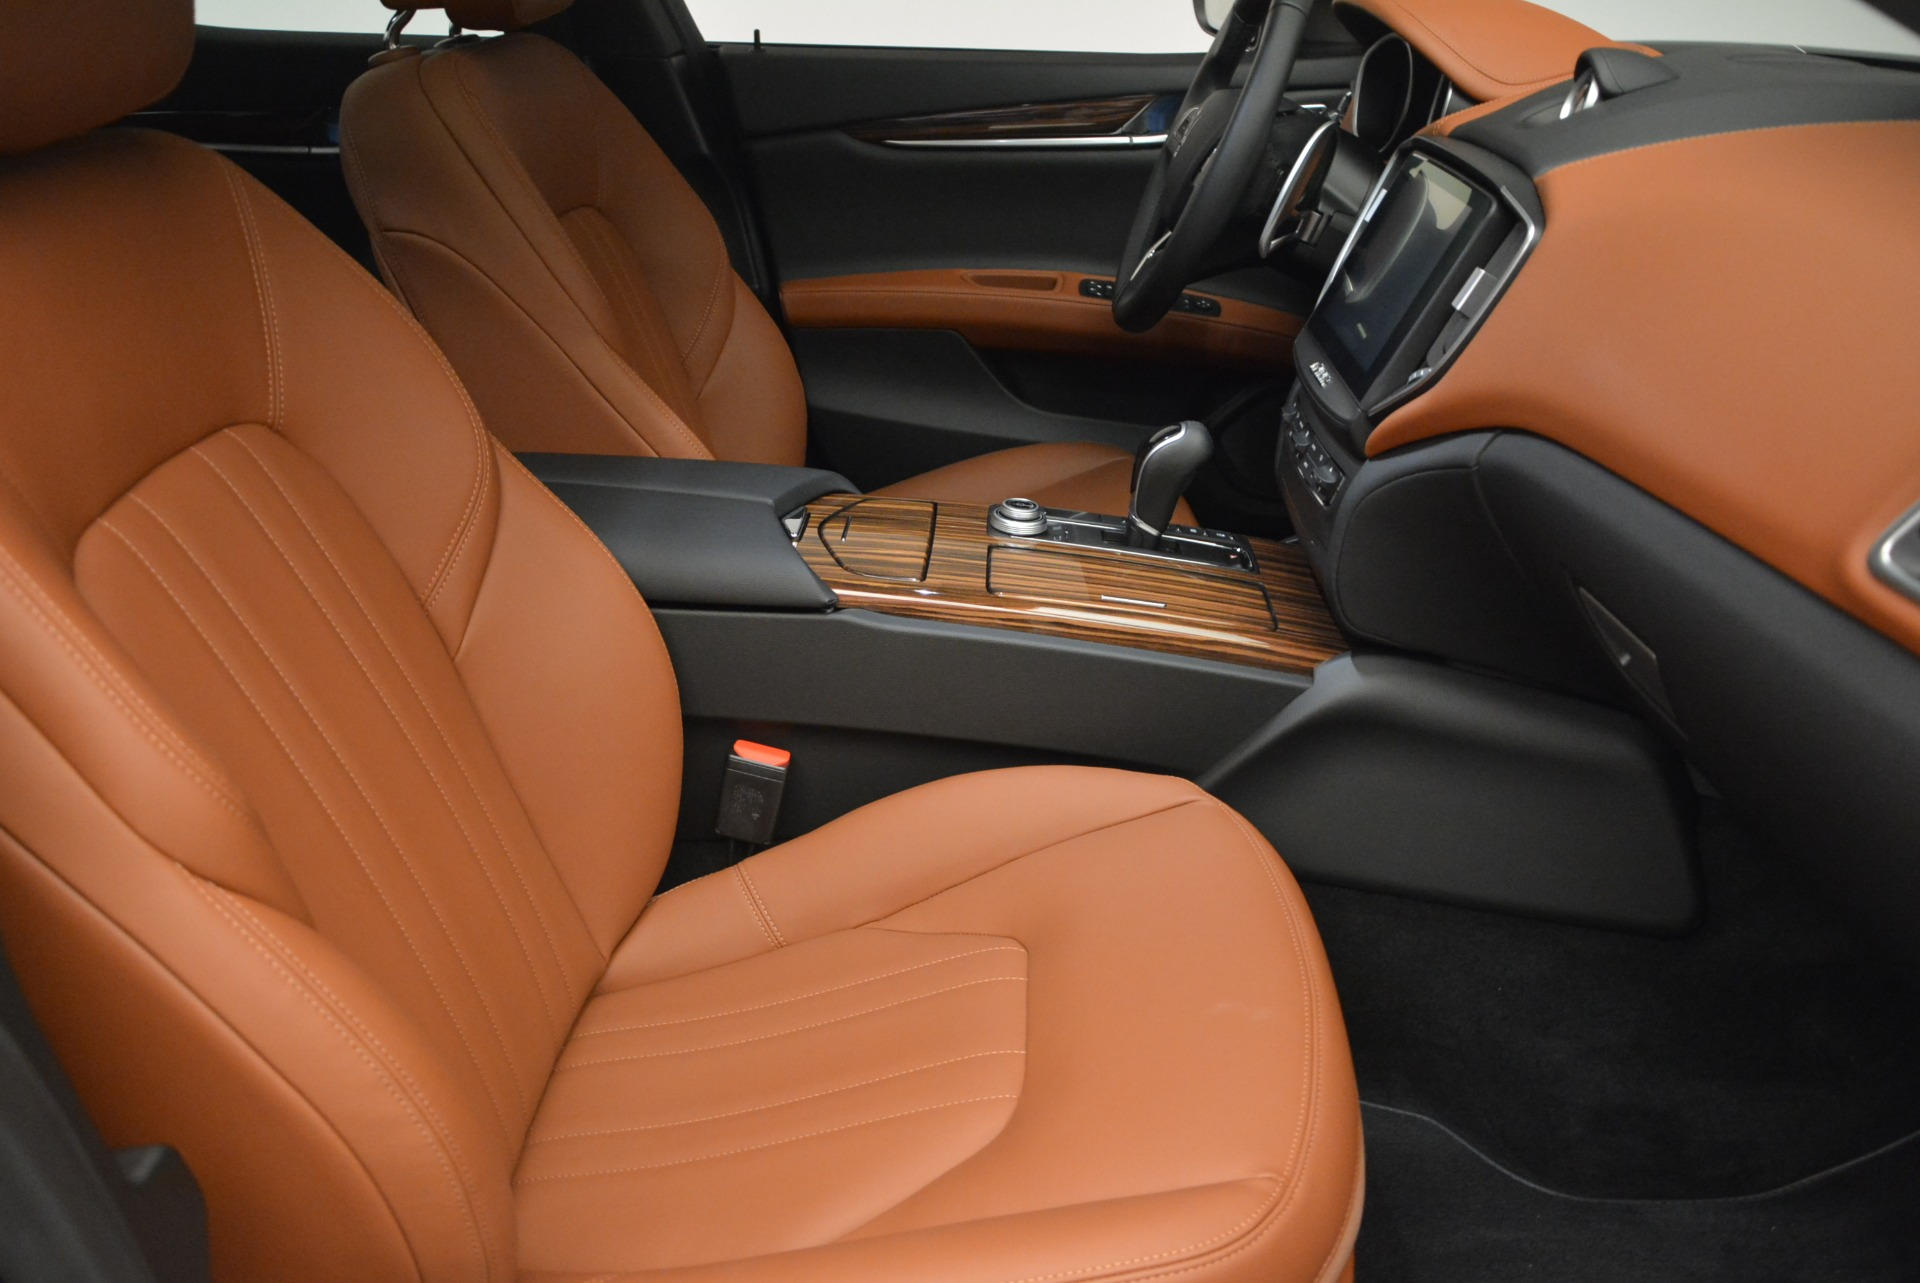 Used 2017 Maserati Ghibli S Q4 EX-LOANER For Sale In Greenwich, CT 608_p21